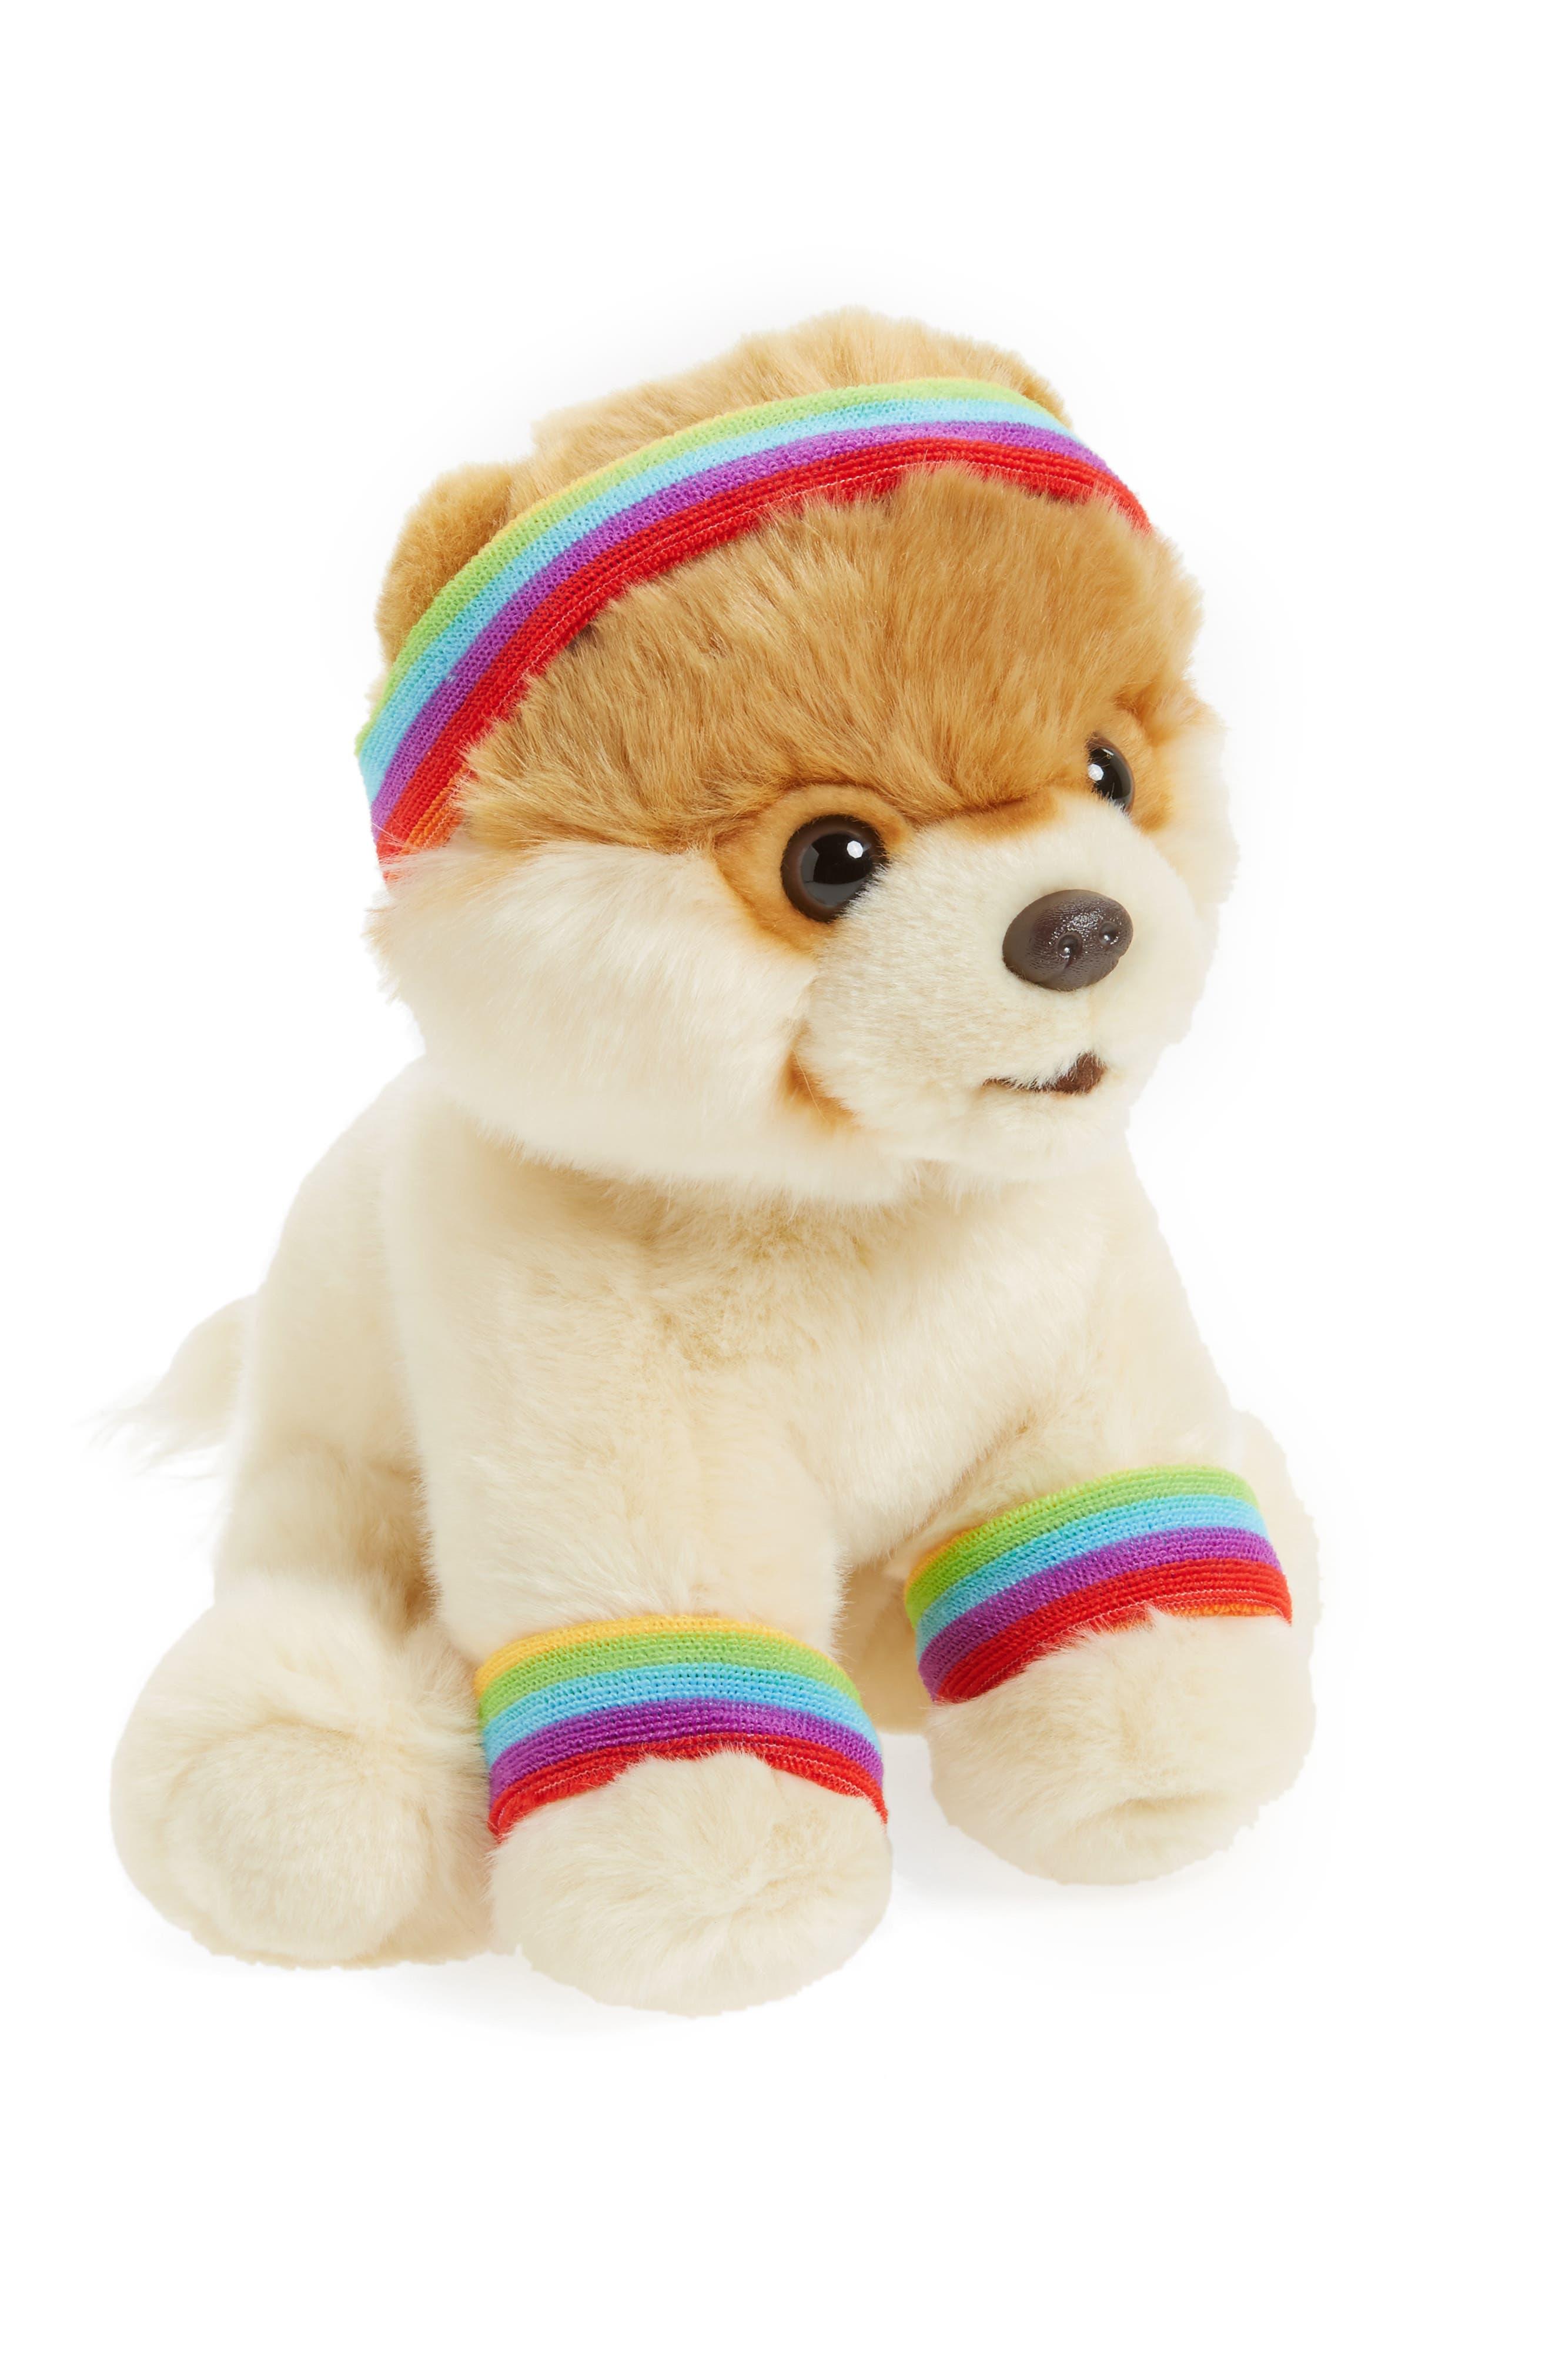 Boo - Exercise Stuffed Animal,                         Main,                         color, Tan